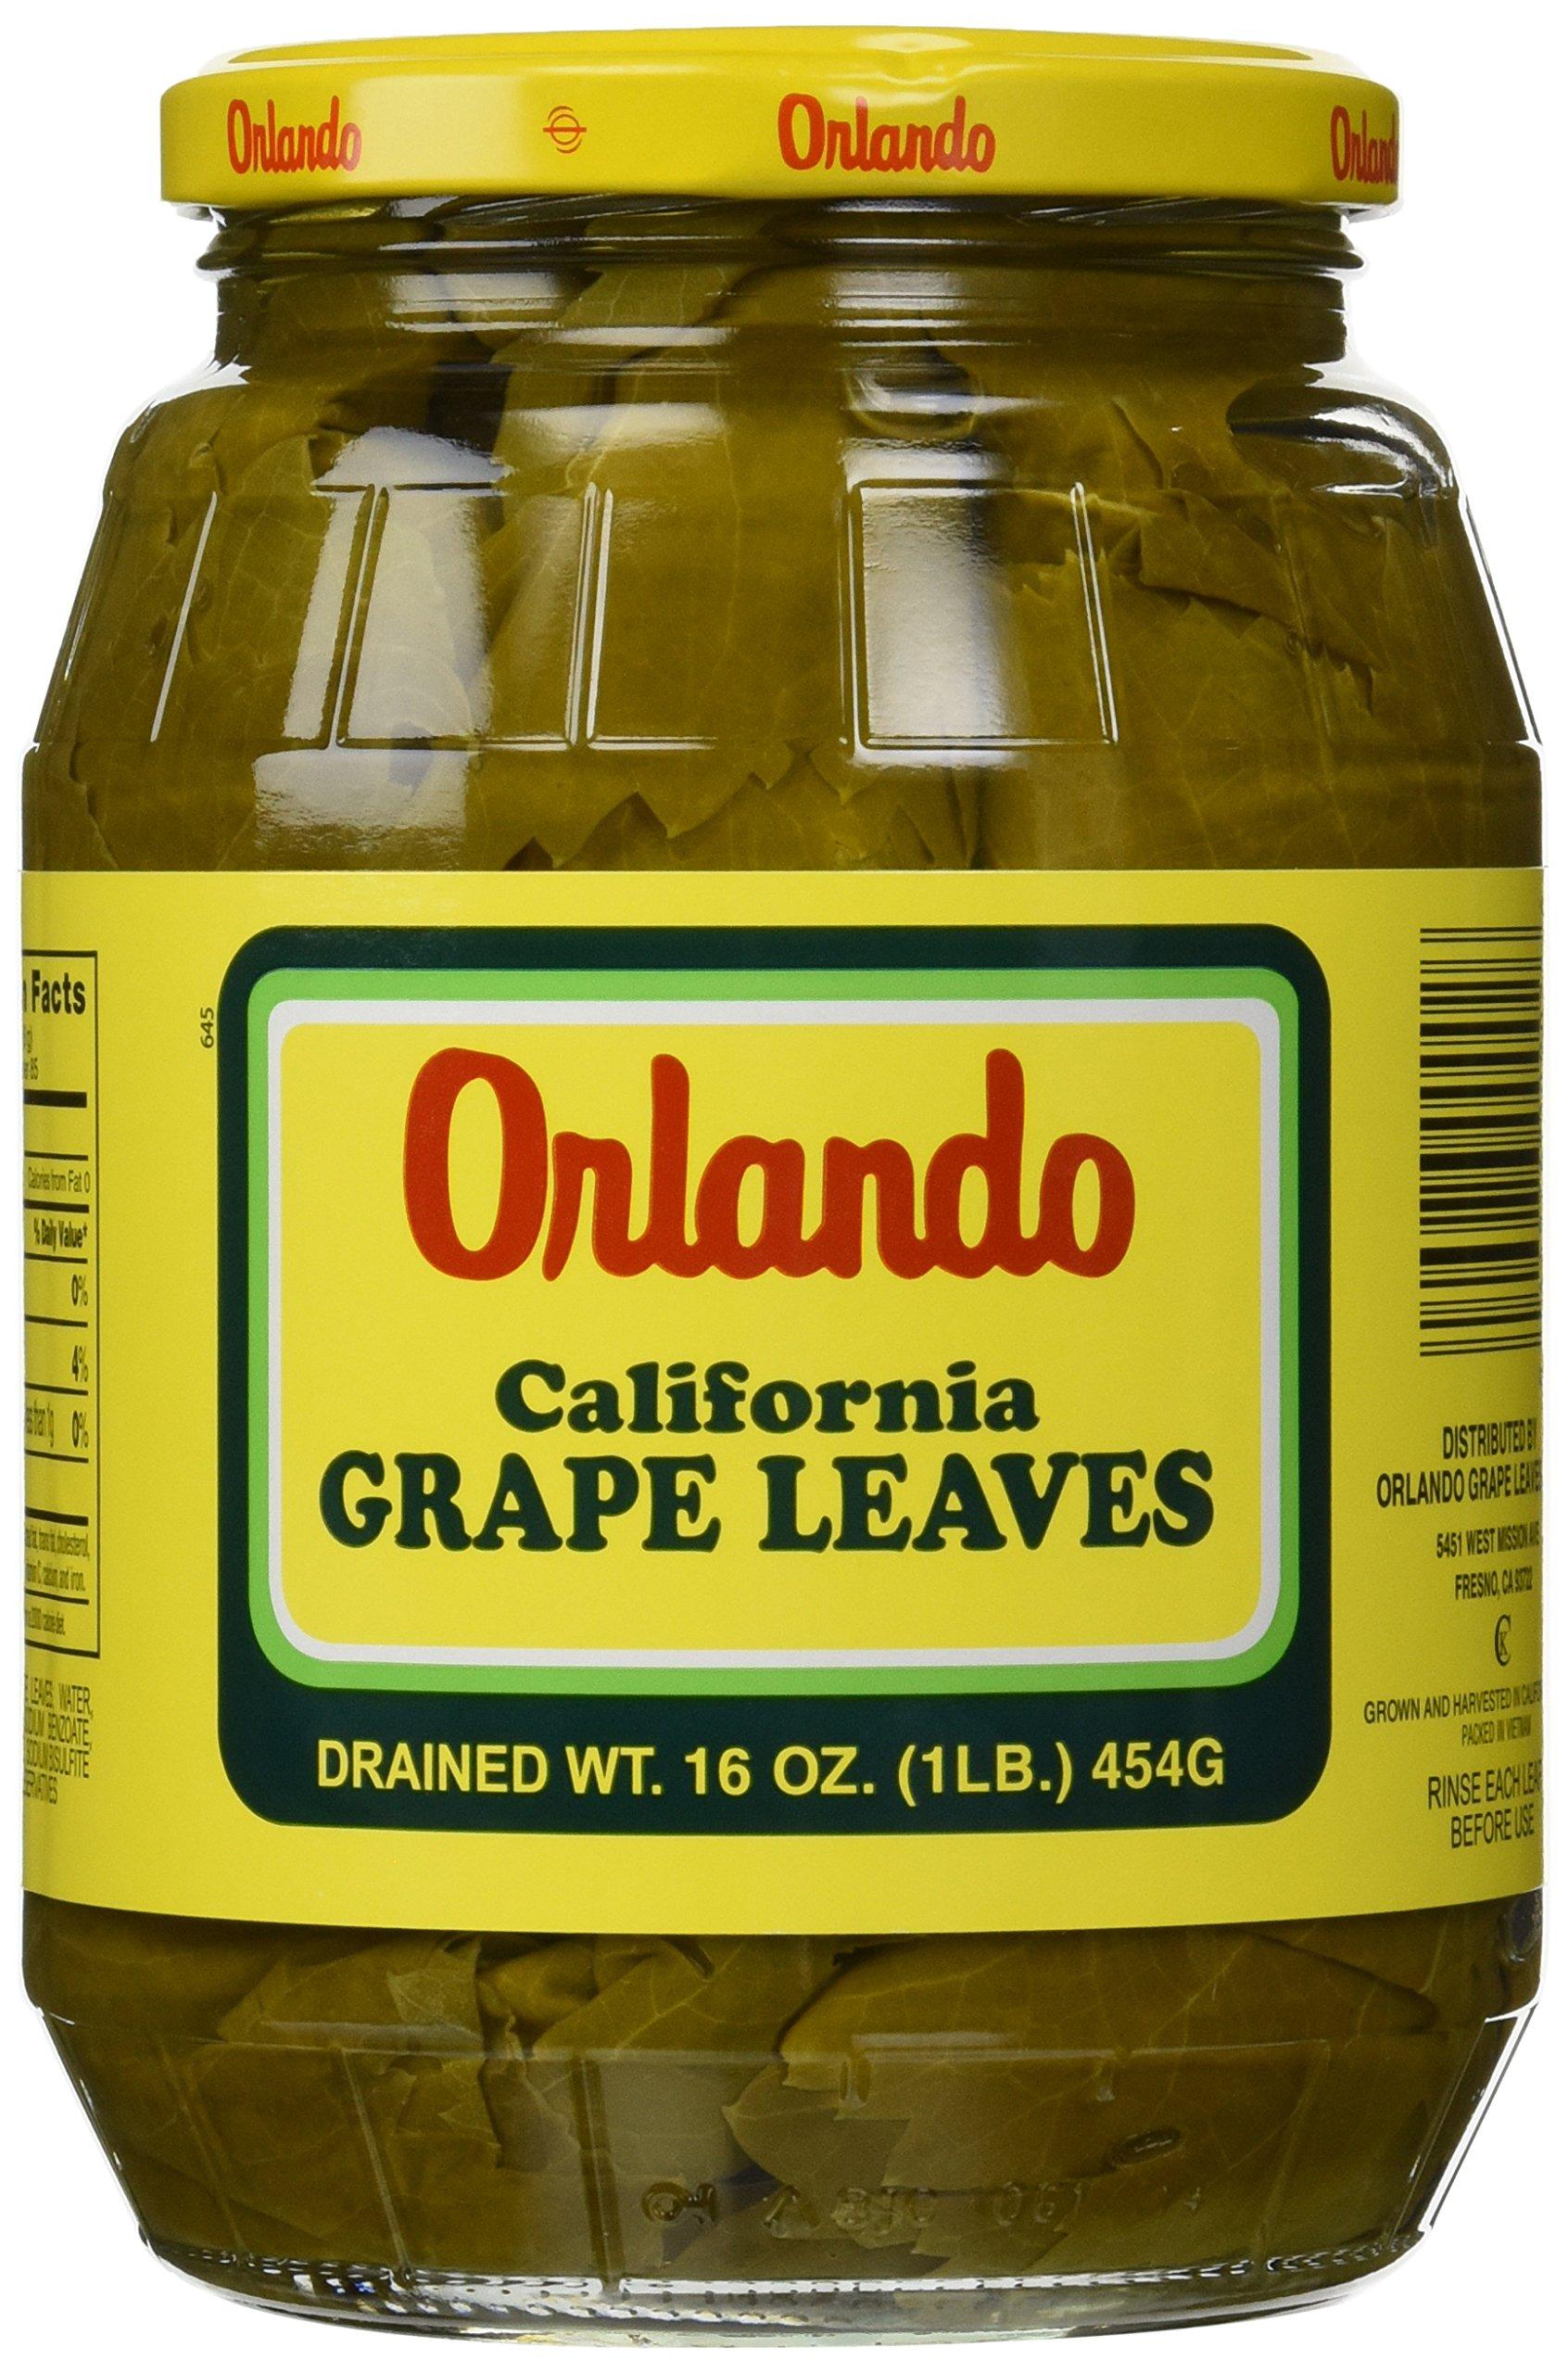 California Grape Leaves -Orlando 2lb jar, DR.WT. 16oz by Orlando